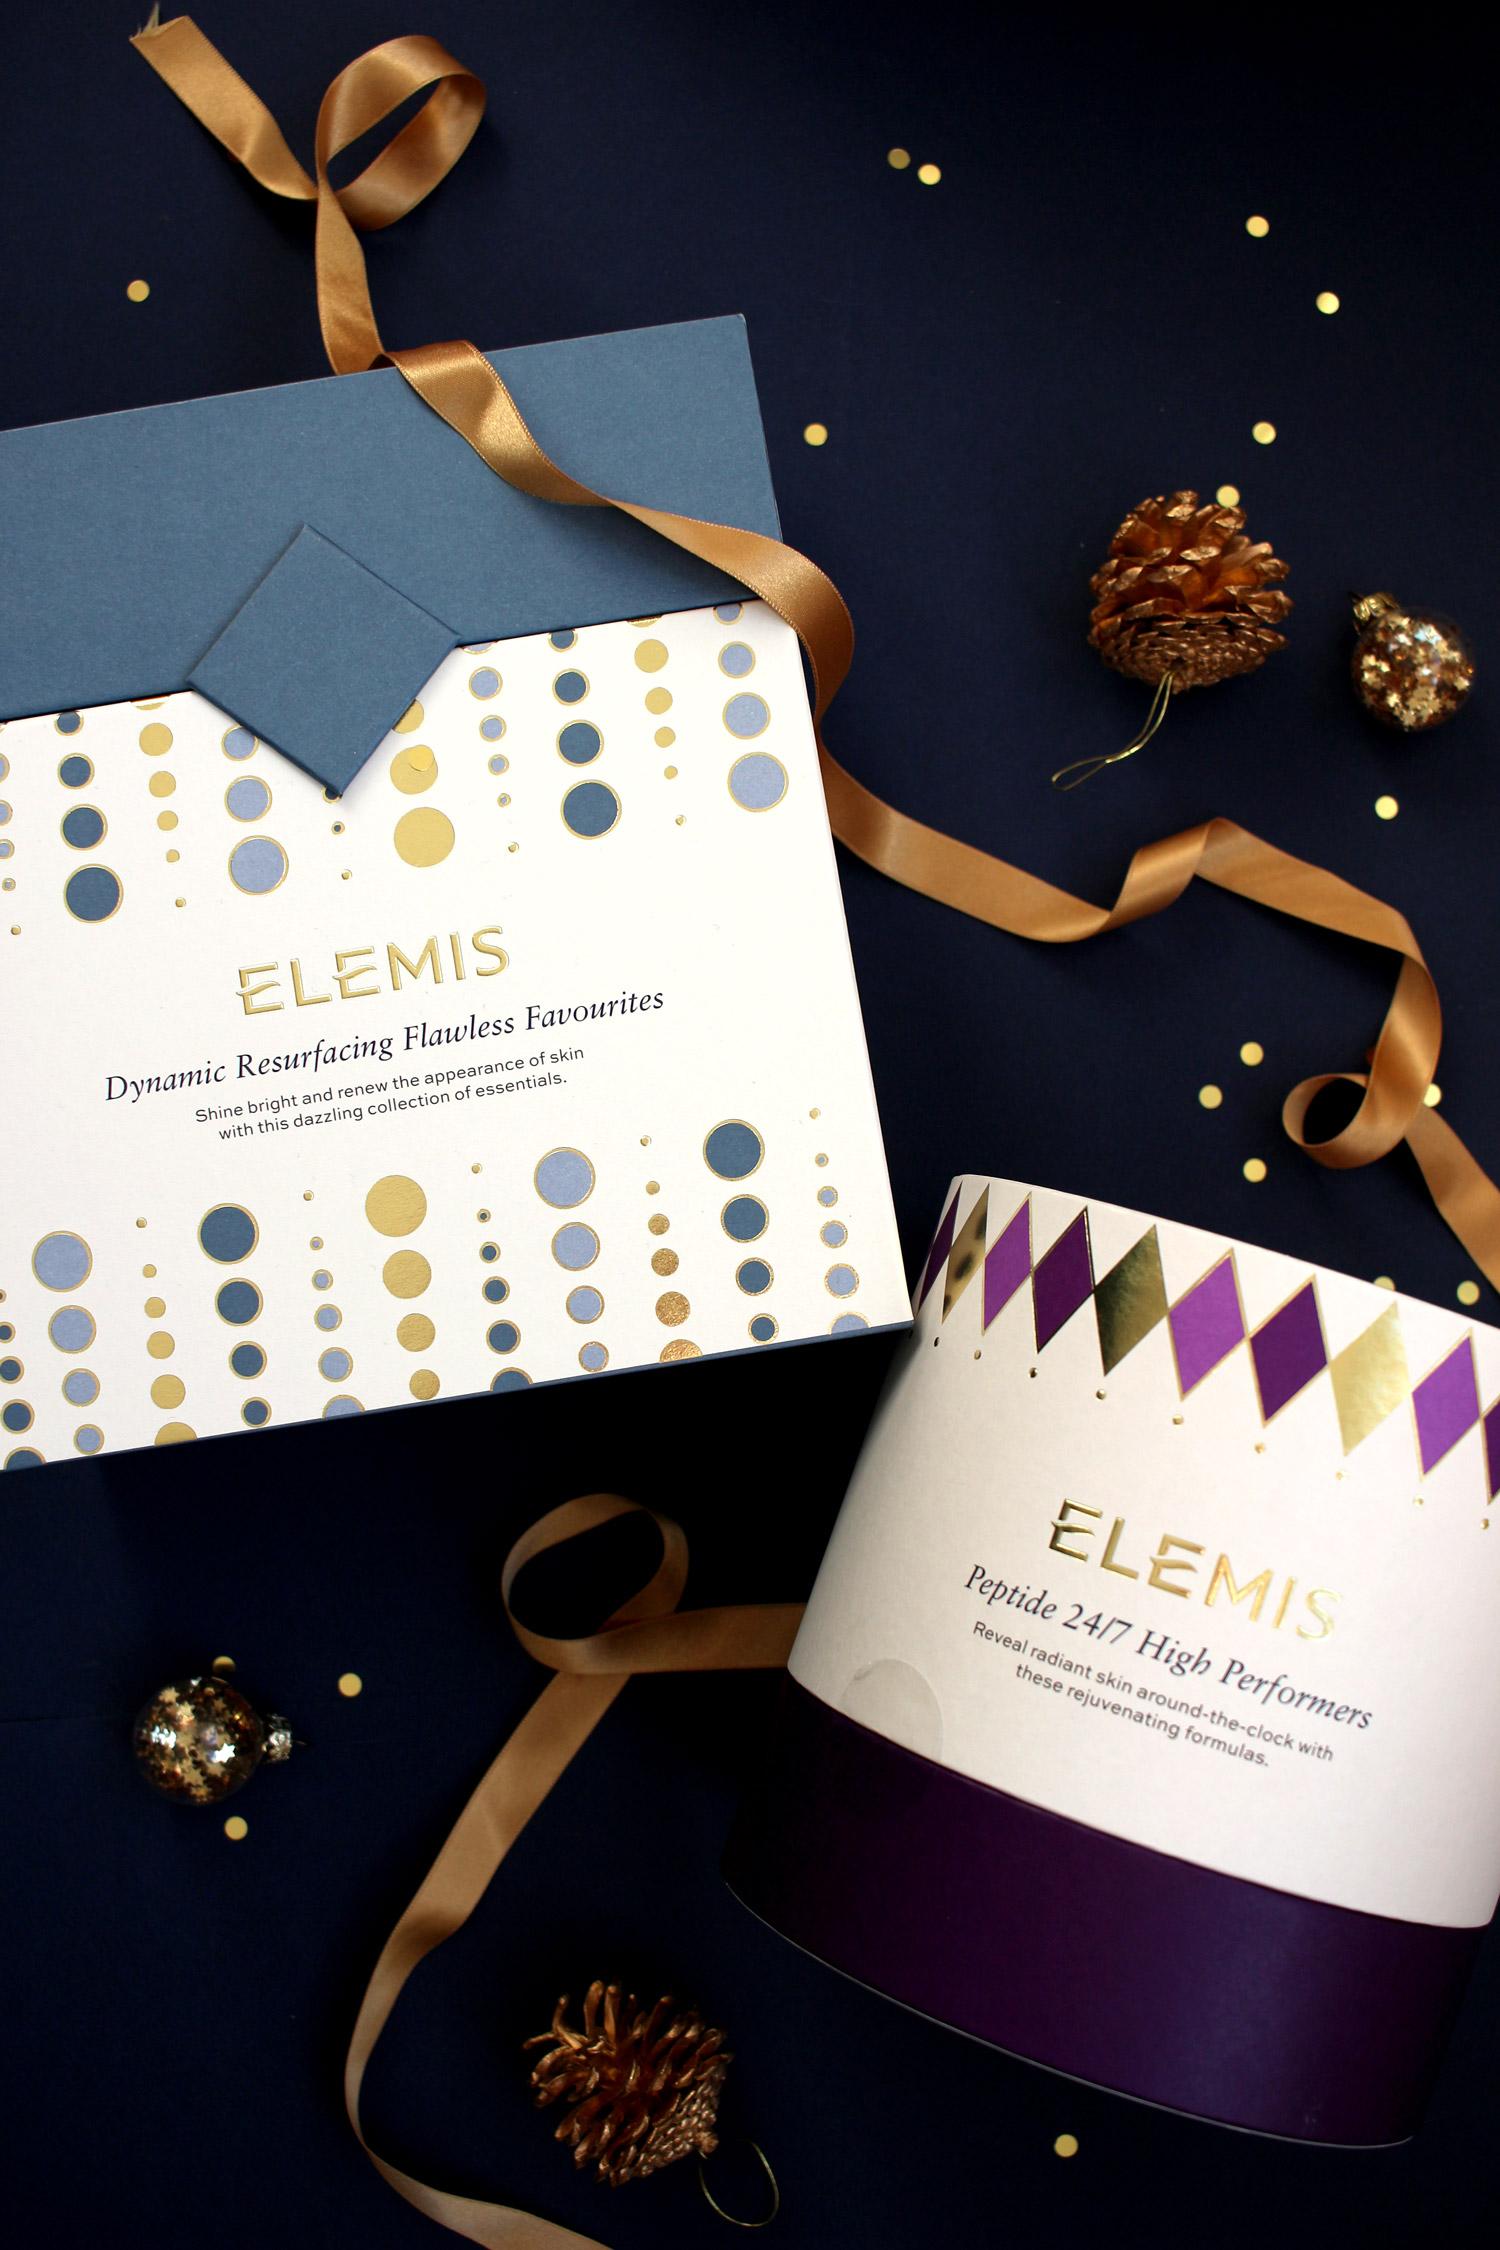 christmas-2020-beauty-gift-guide-skincare-elemis-peptide-set-resurfacing